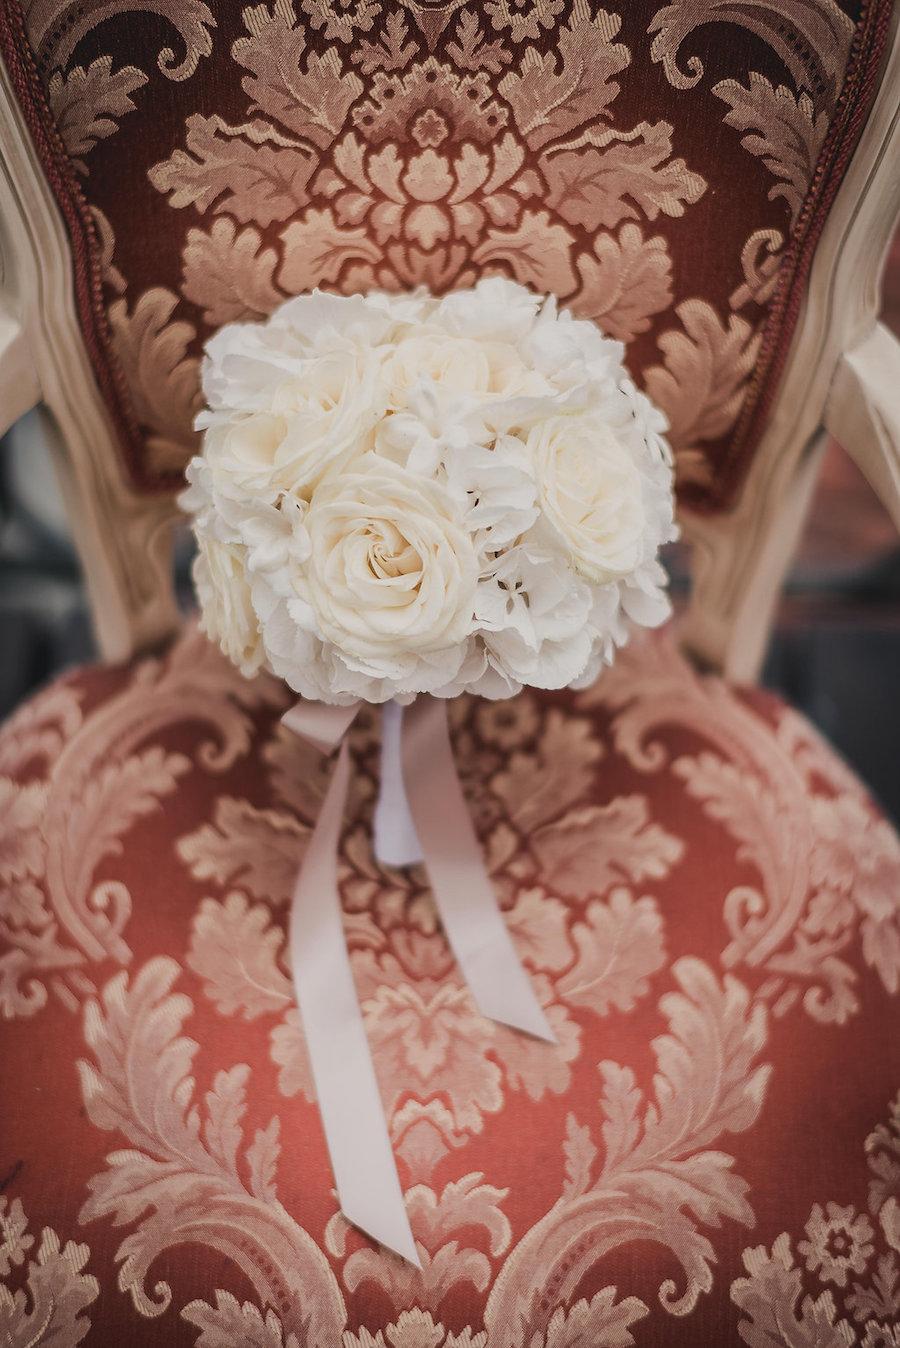 Matrimonio Tema Viaggi Vintage : Un matrimonio ispirato ai viaggi a venezia wedding